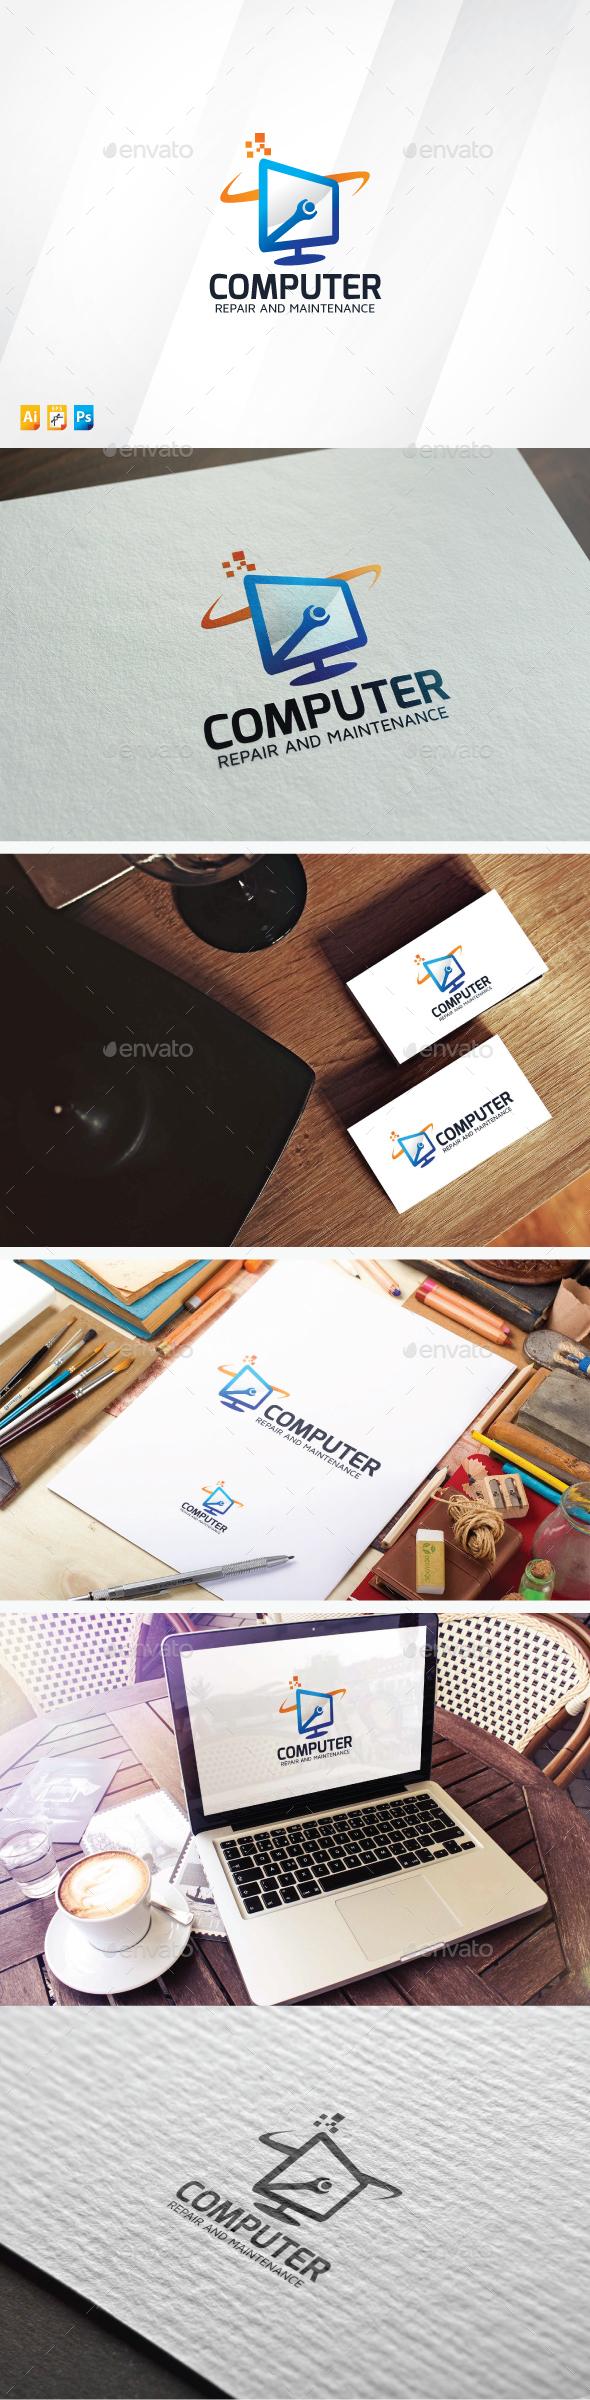 Computer Maintenance - Objects Logo Templates